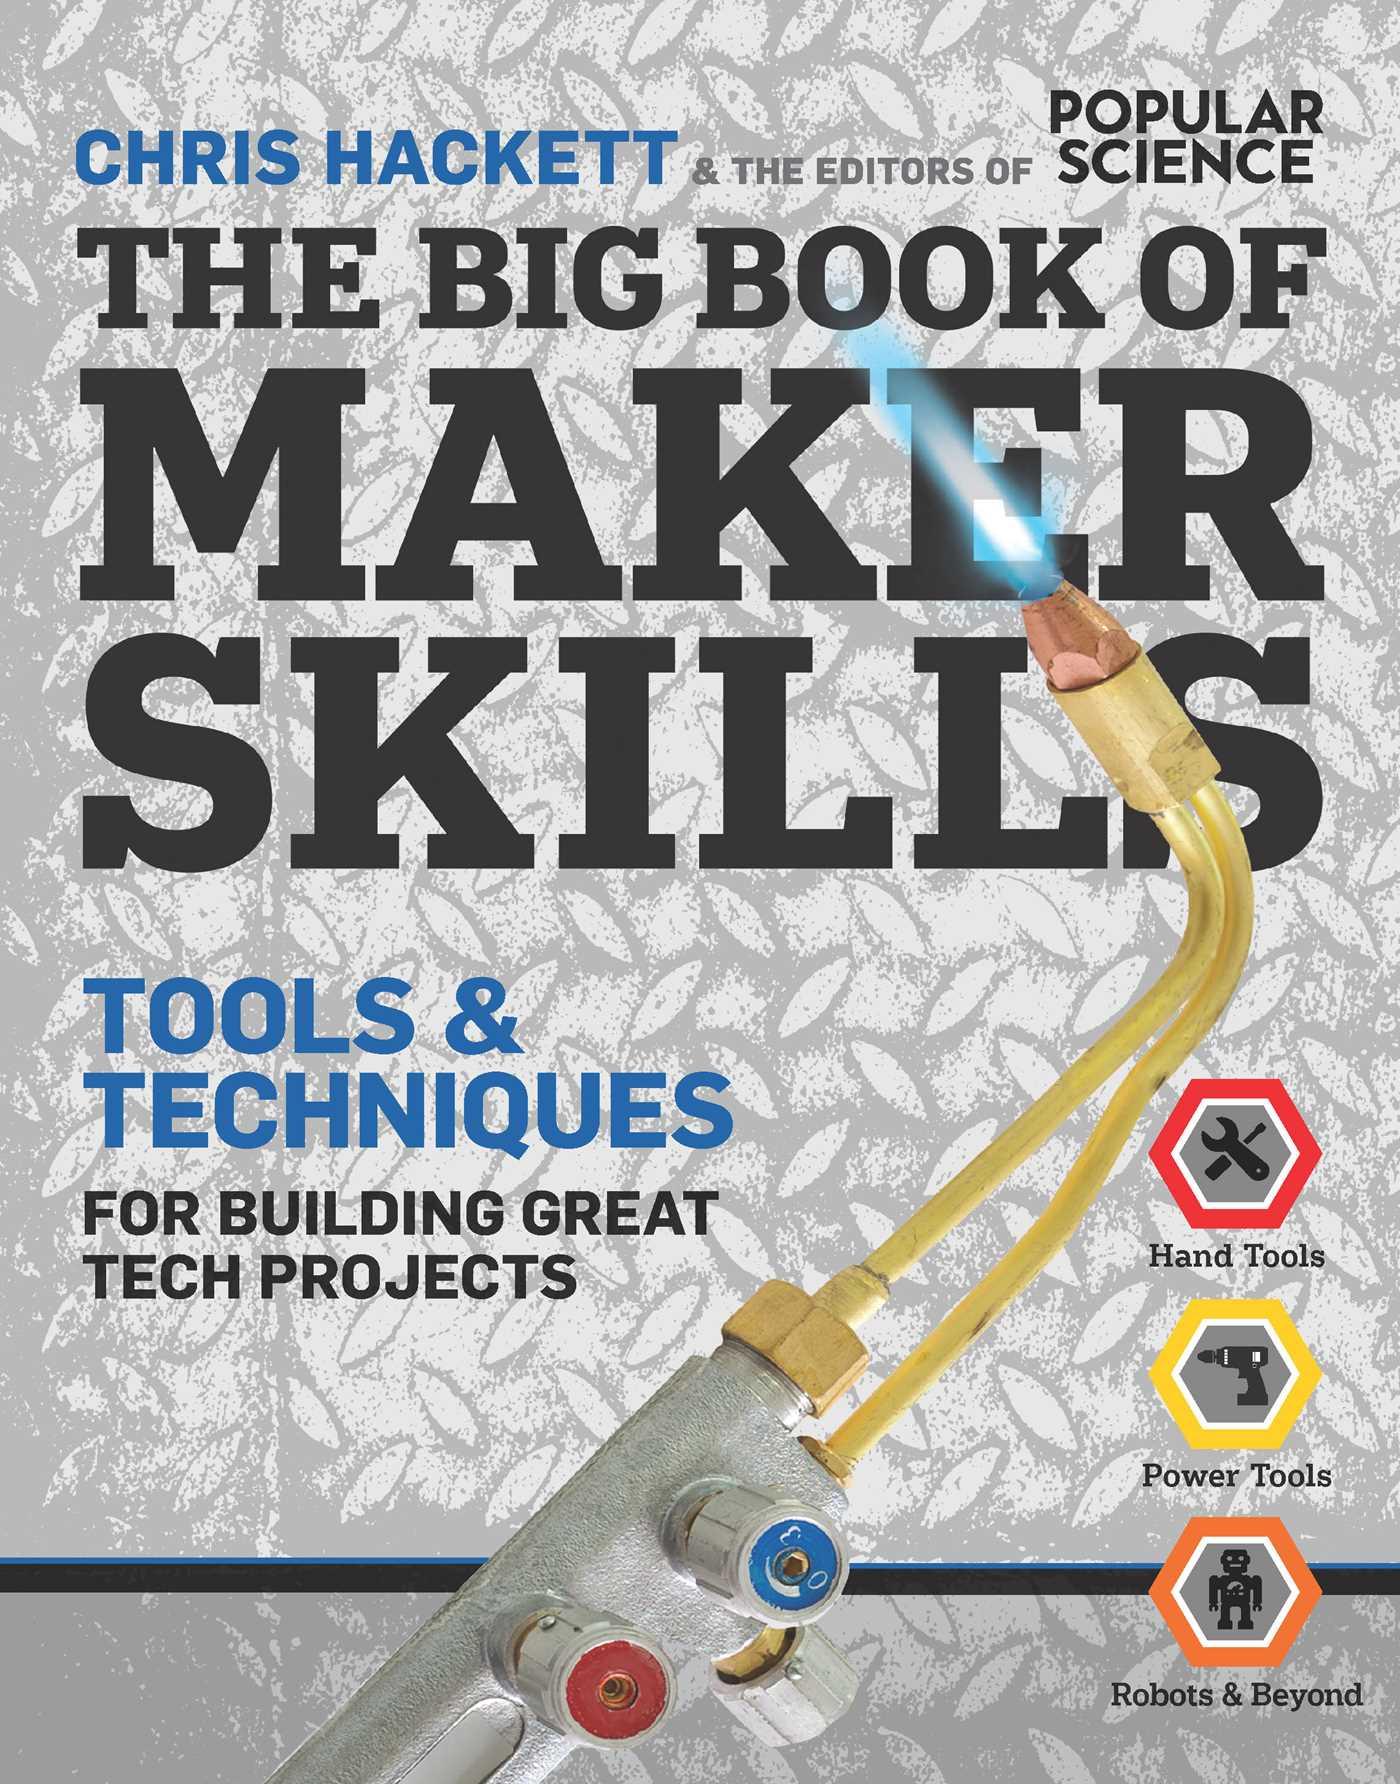 big book of maker skills.jpg